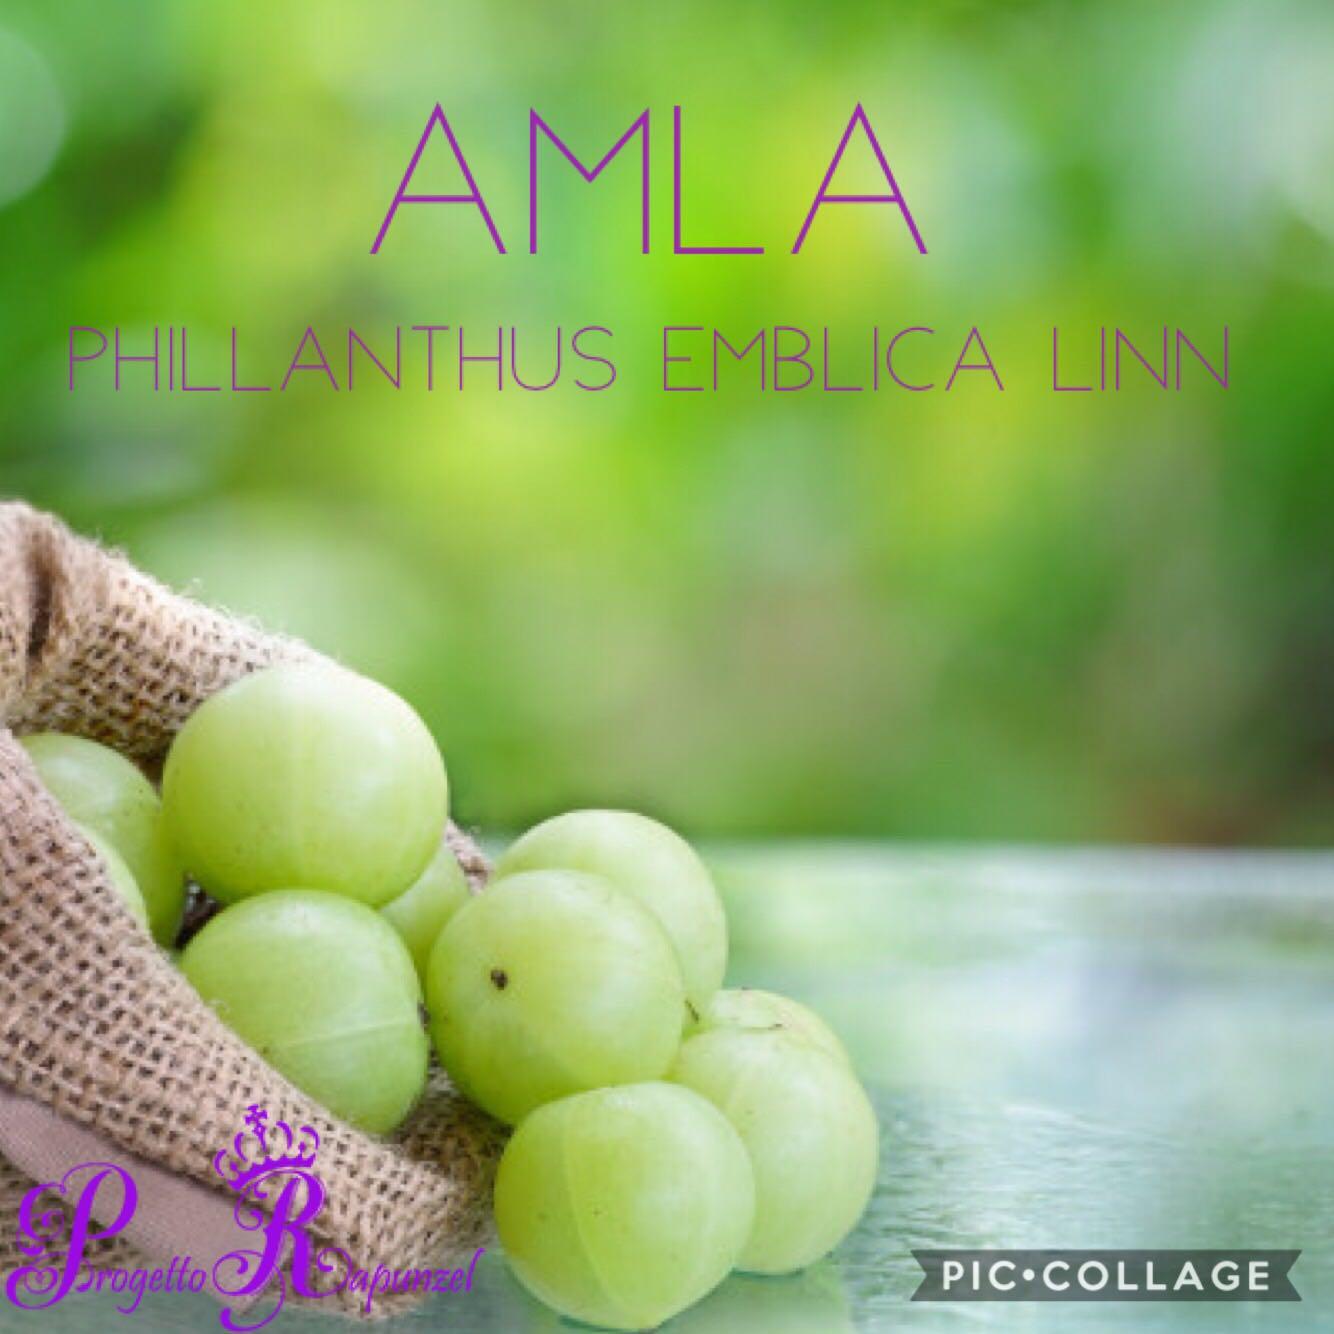 AMLA(PHYLLANTHUS EMBLICA)